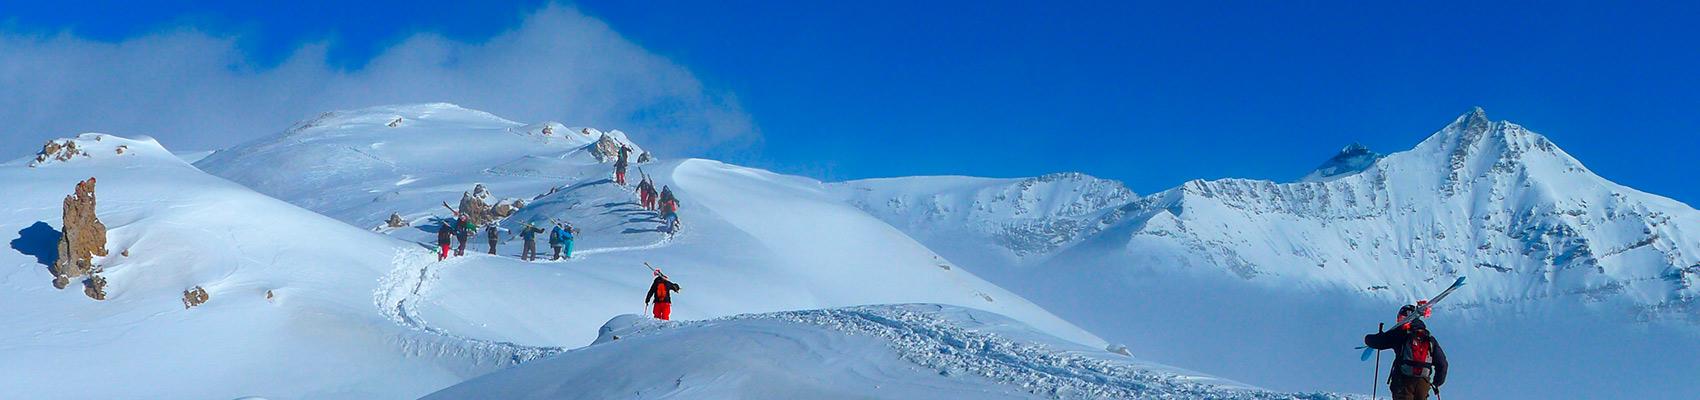 Ski Freeride avec guide à Superbesse - Evolution 2